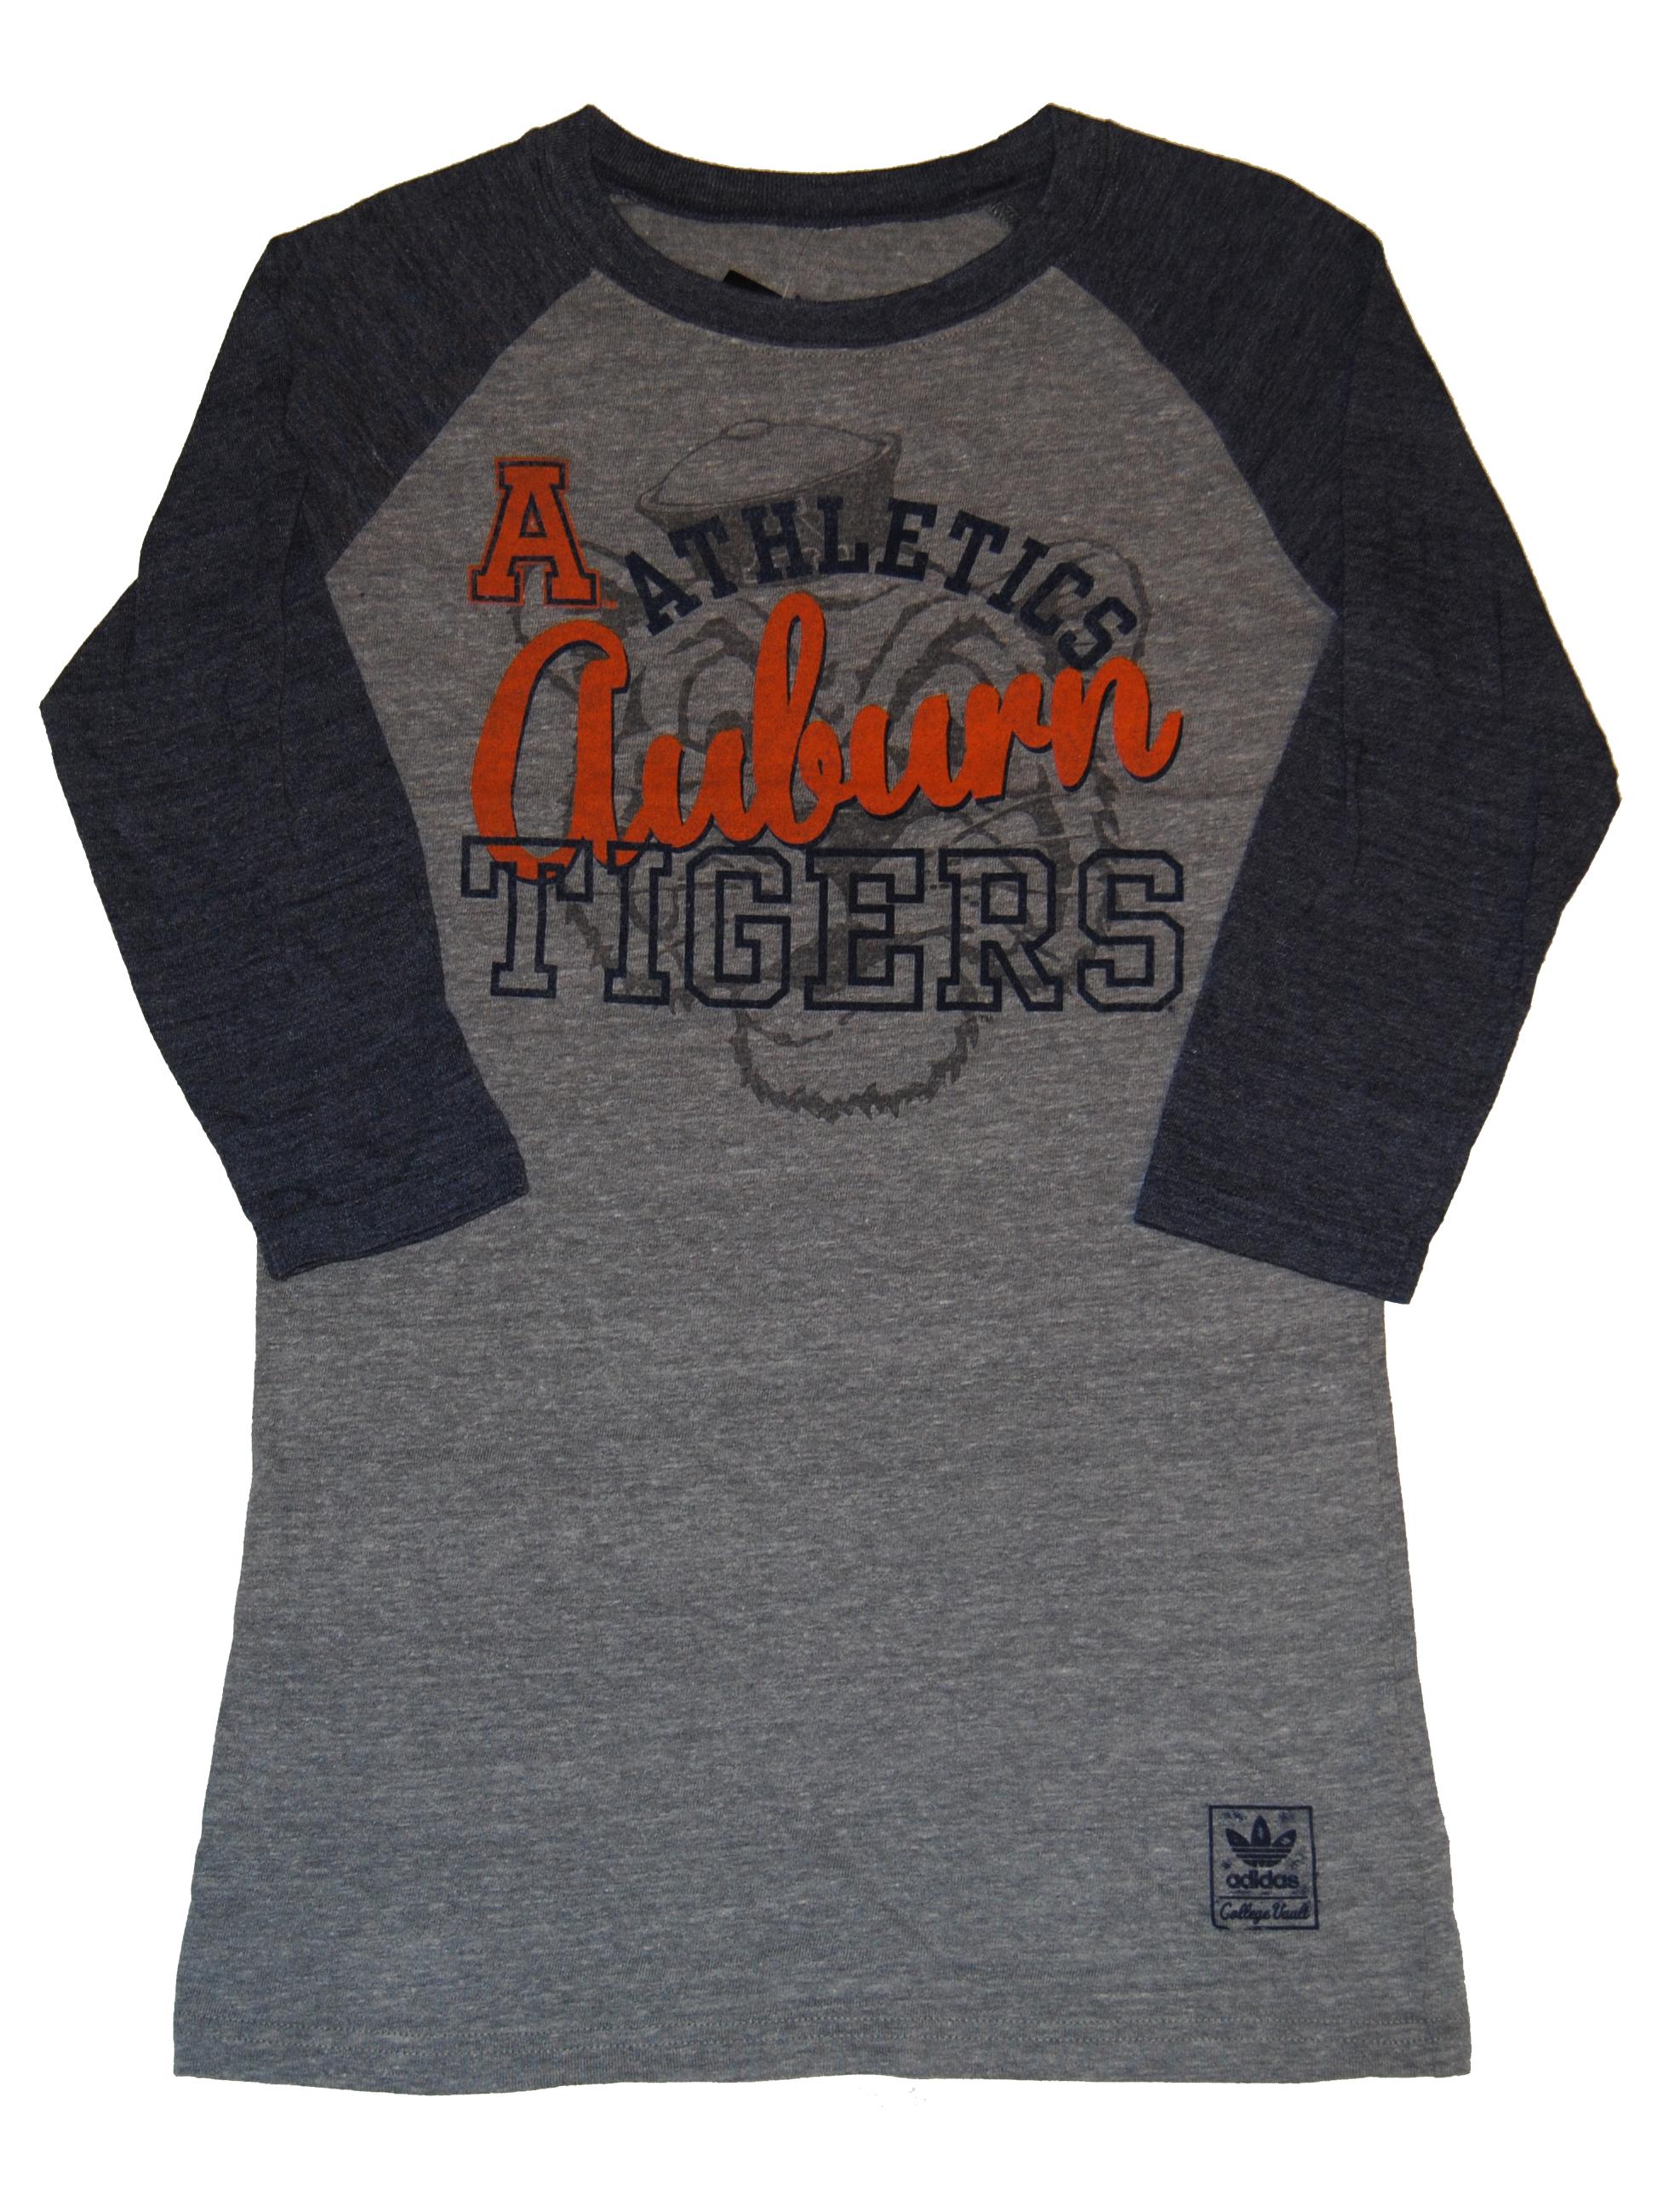 Adidas Auburn Tigers  Womens Gray Navy Athletics Three Quarter Sleeve T-Shirt (S) at Sears.com